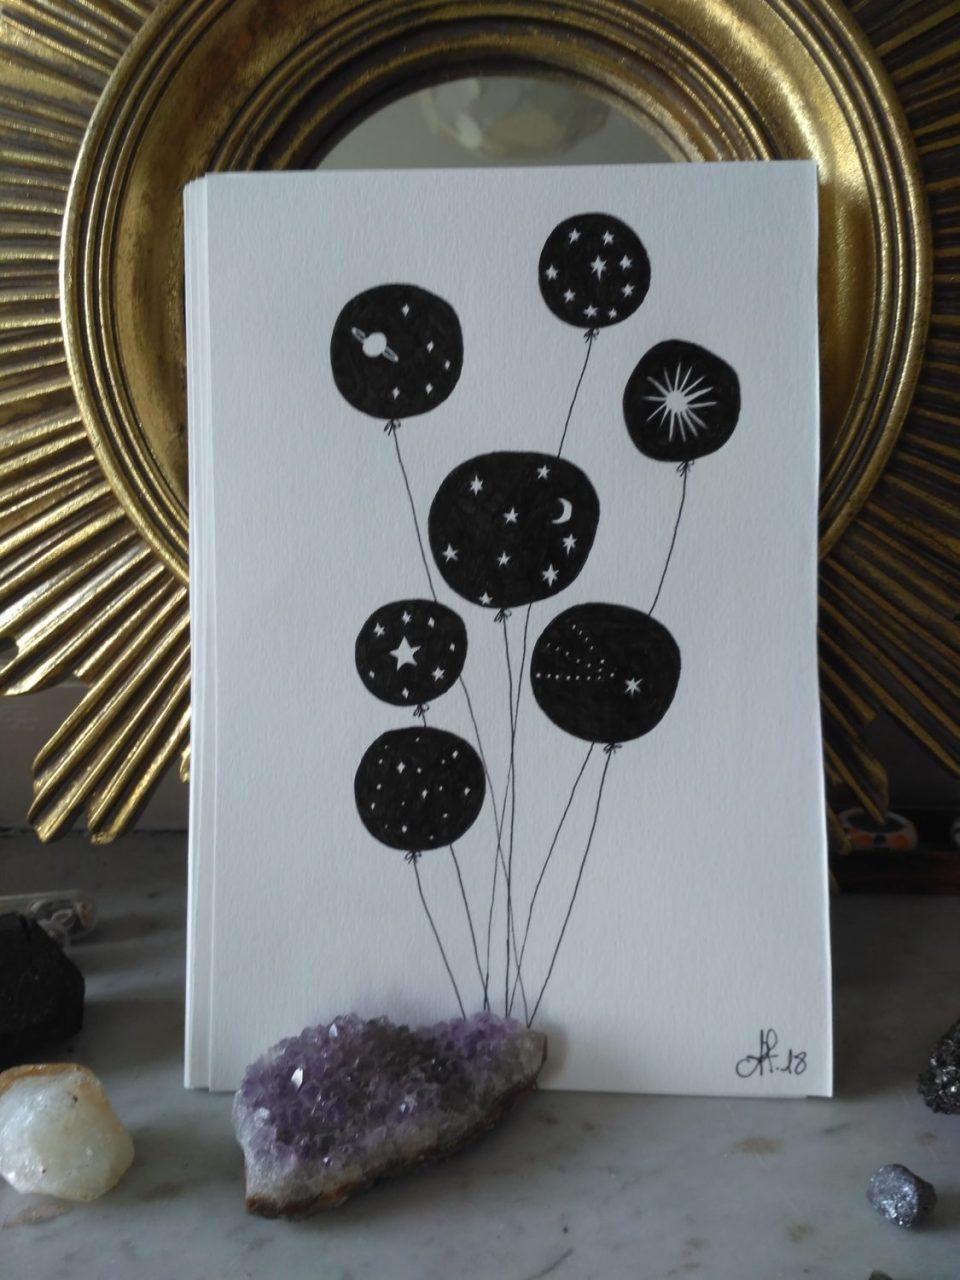 inktober-ballons